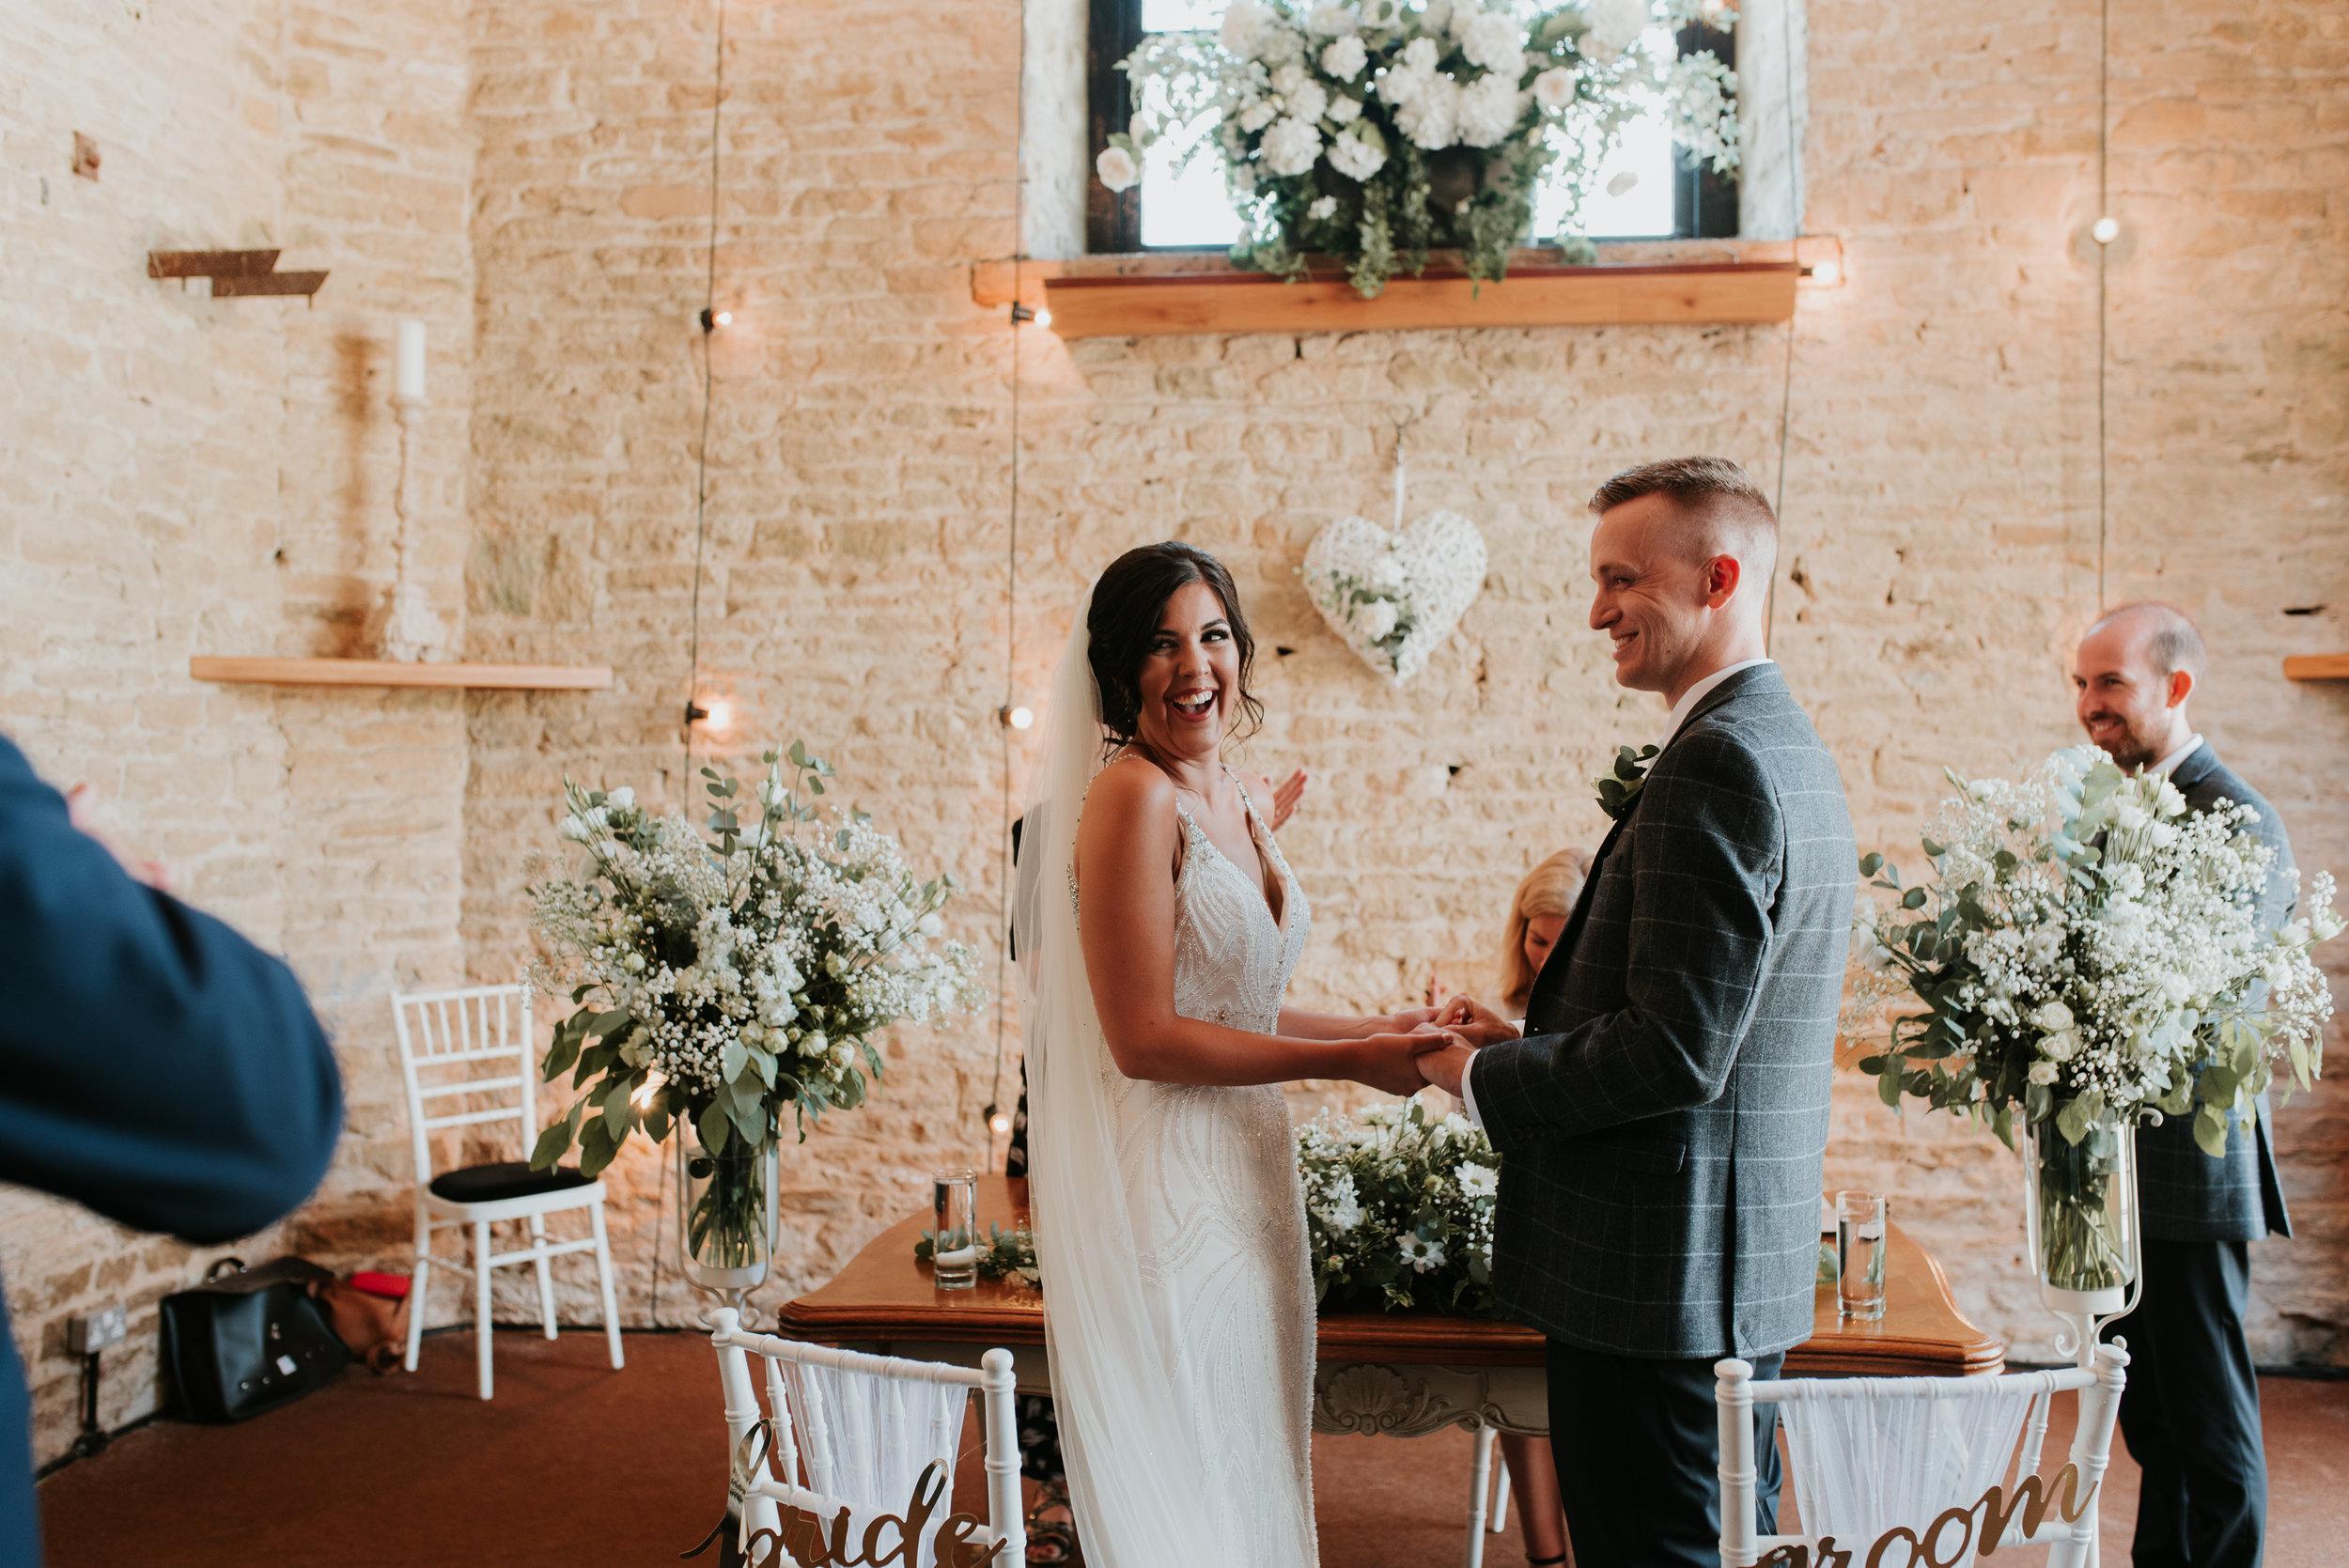 Oxfordshire-wedding-photographer-39.jpg